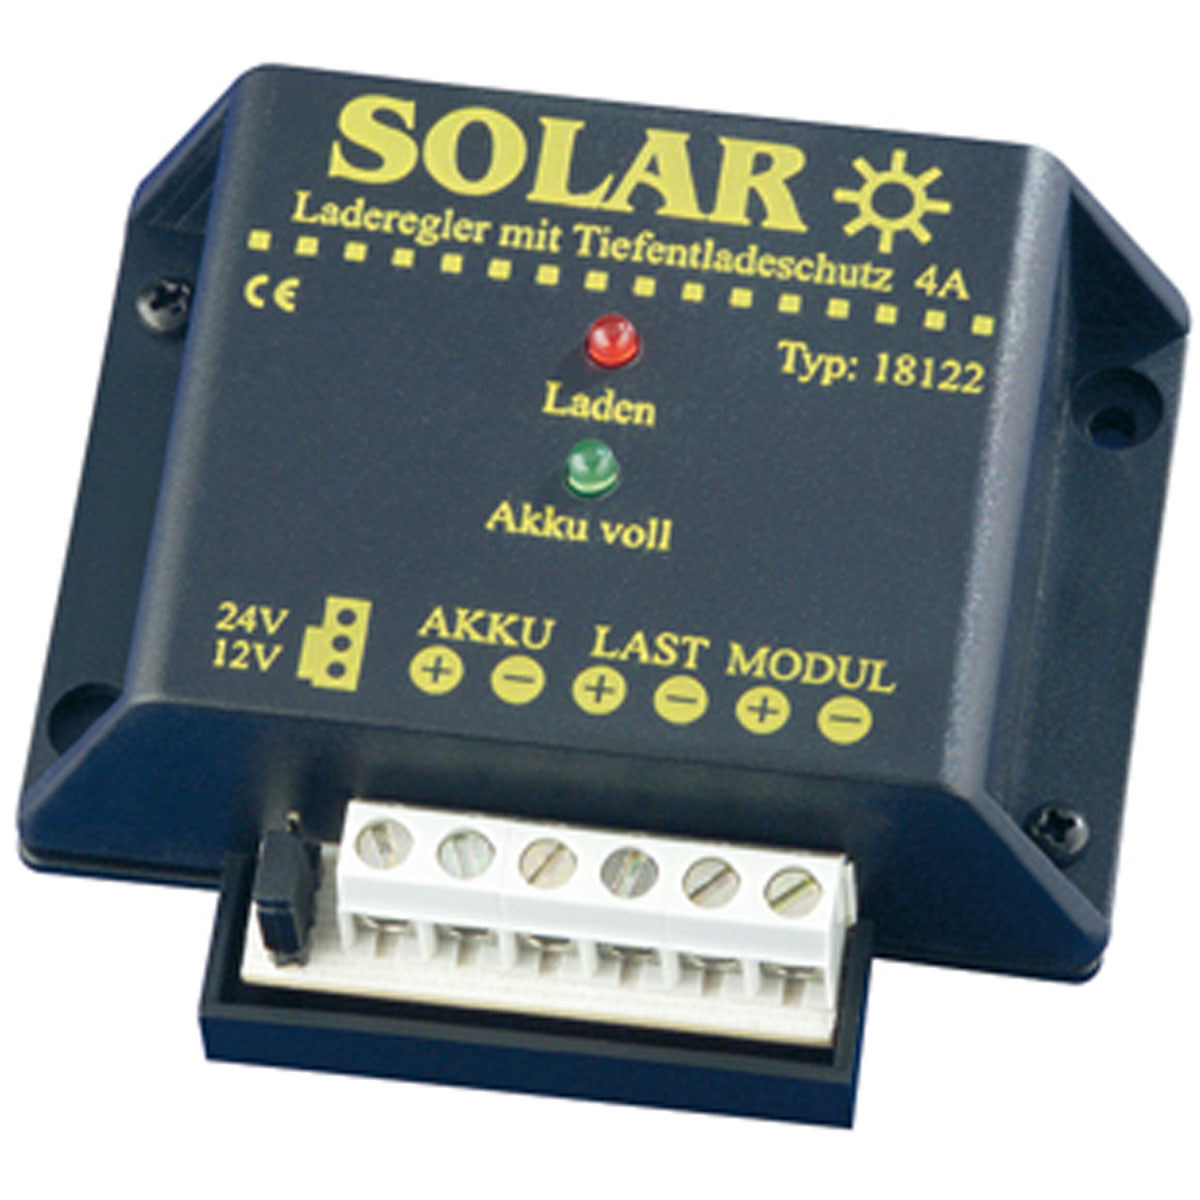 12V/24V napelemes töltésvezérlő 4A Kisülés védelemmel